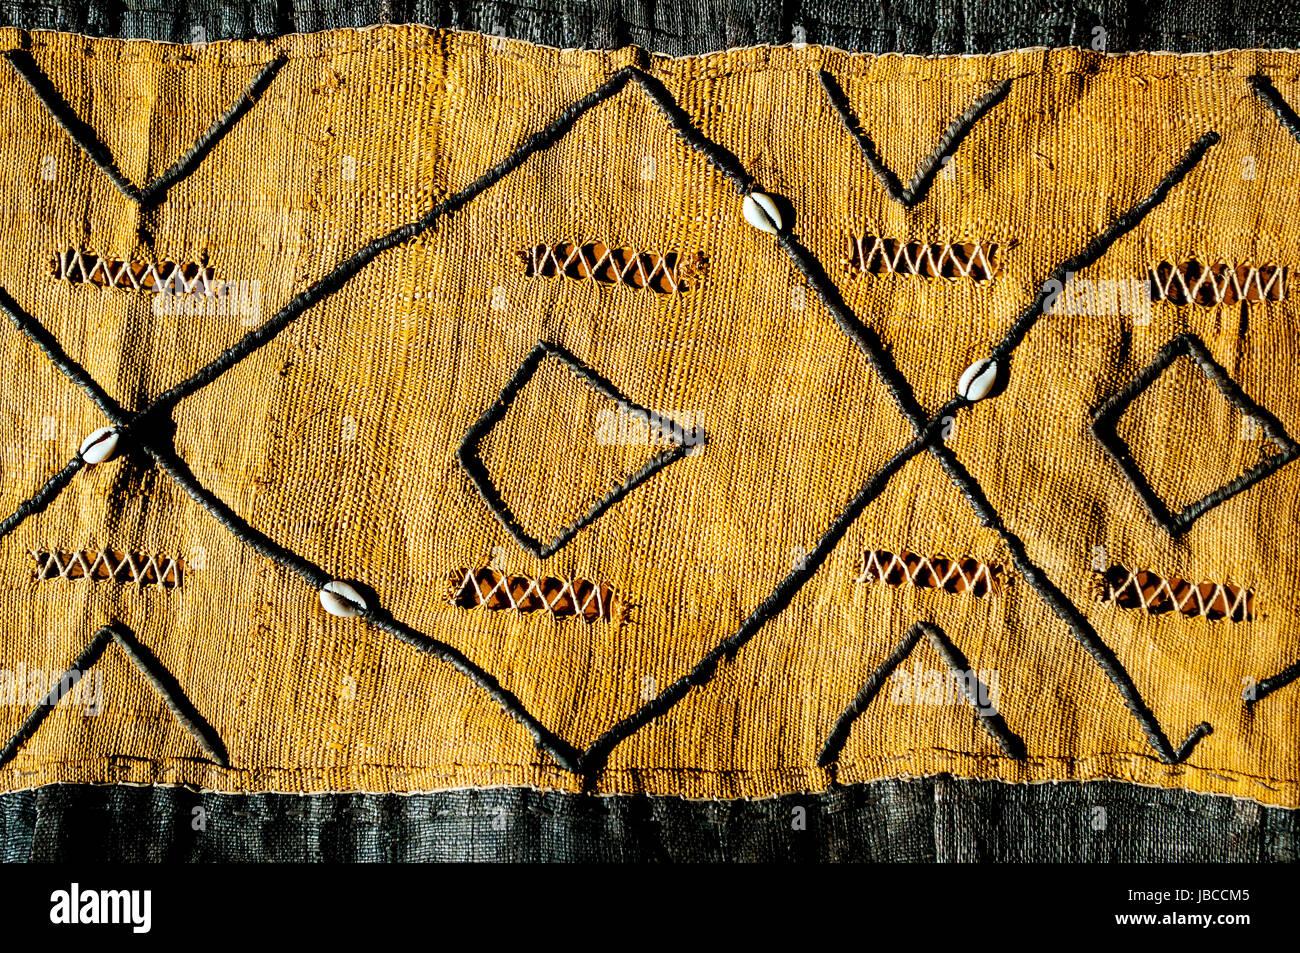 Kuba-Bast-Tuch aus der Demokratischen Republik Kongo in Studioumgebung Stockbild